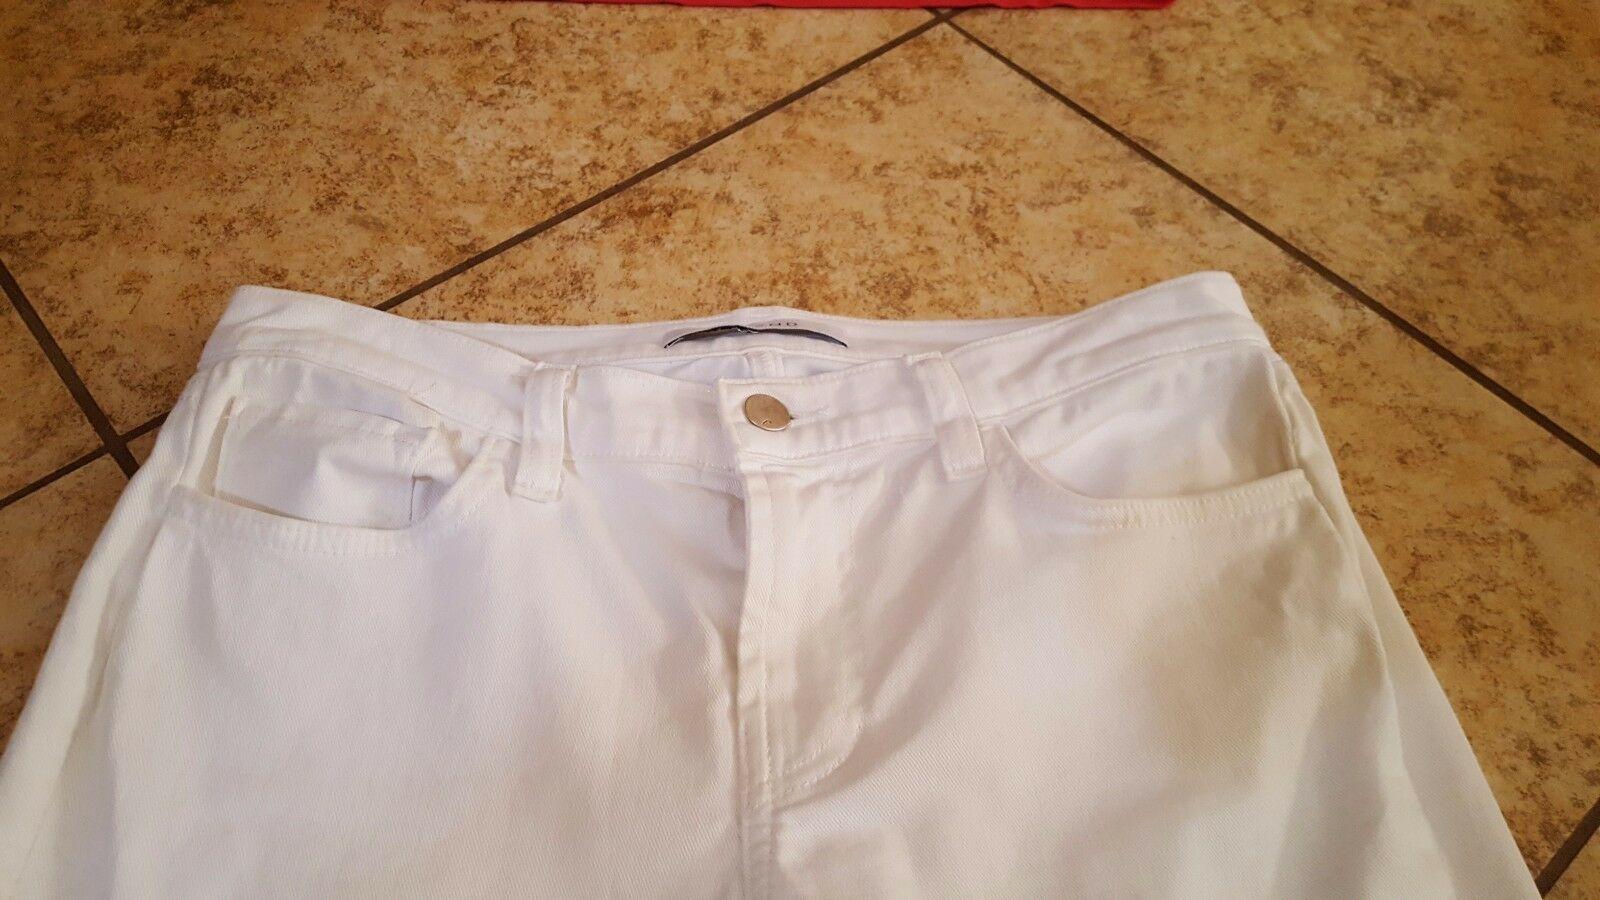 J Brand Jeans Women's Cropped  White Jeans sz 25 Denim  NICE!! #333 image 2